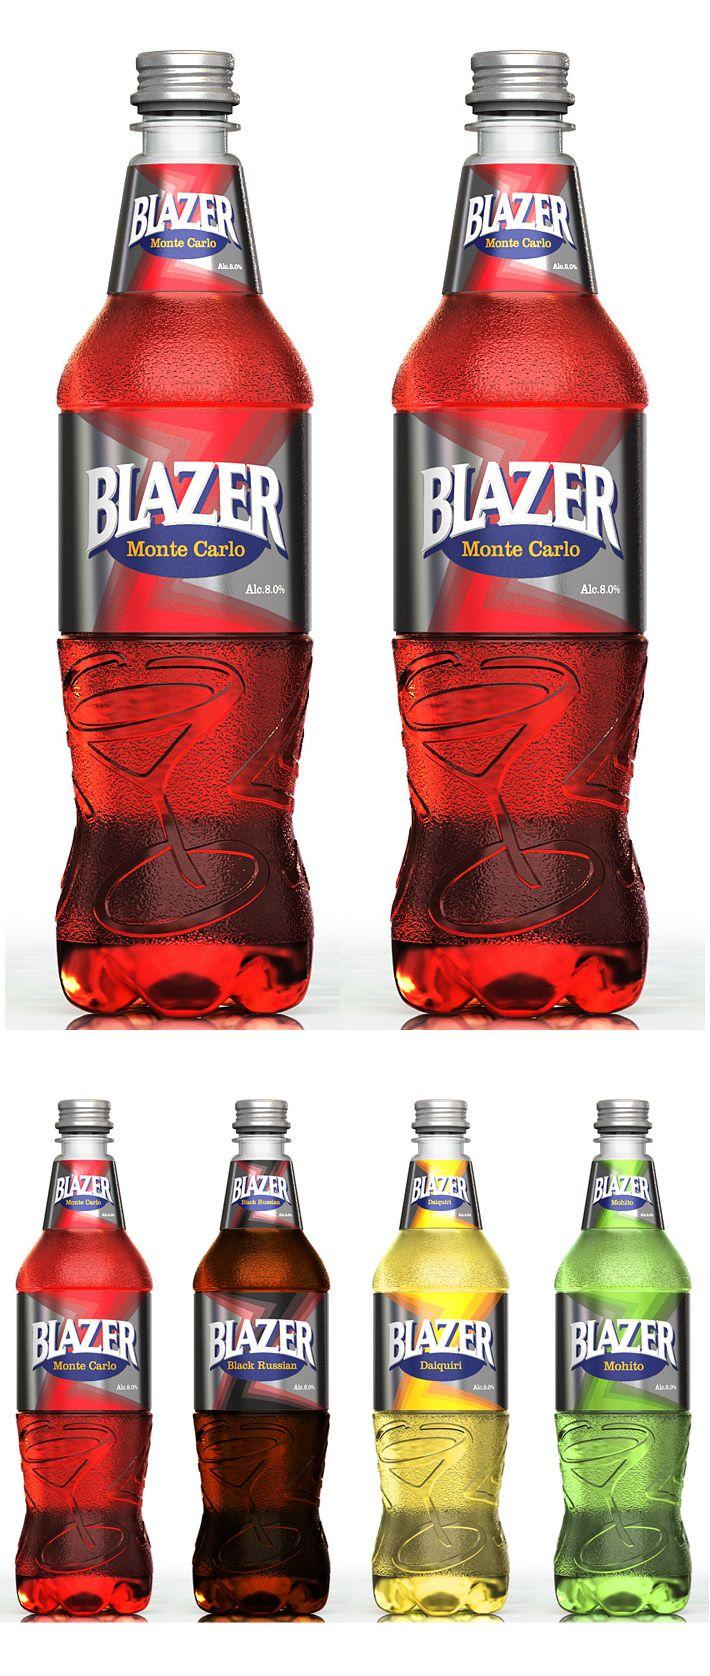 Packaging Design For Blazer Cocktail Re Design The Labels Redizajn Etiketki Koktejlya Blazer Etiketki